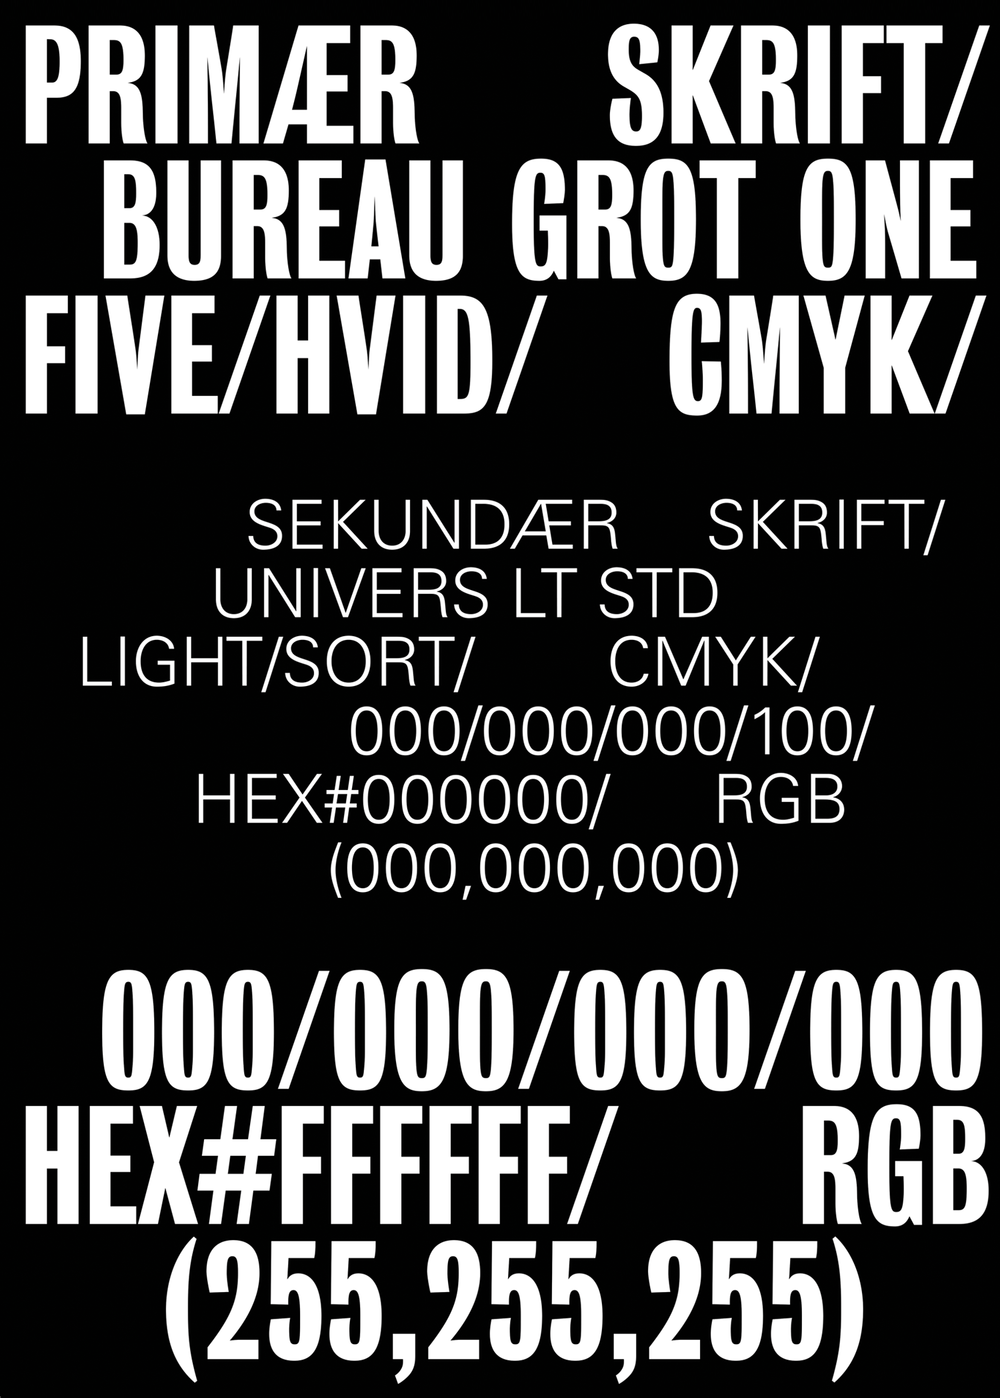 Fuhr_Studio_Void_Brand_Identity_Design_12.png